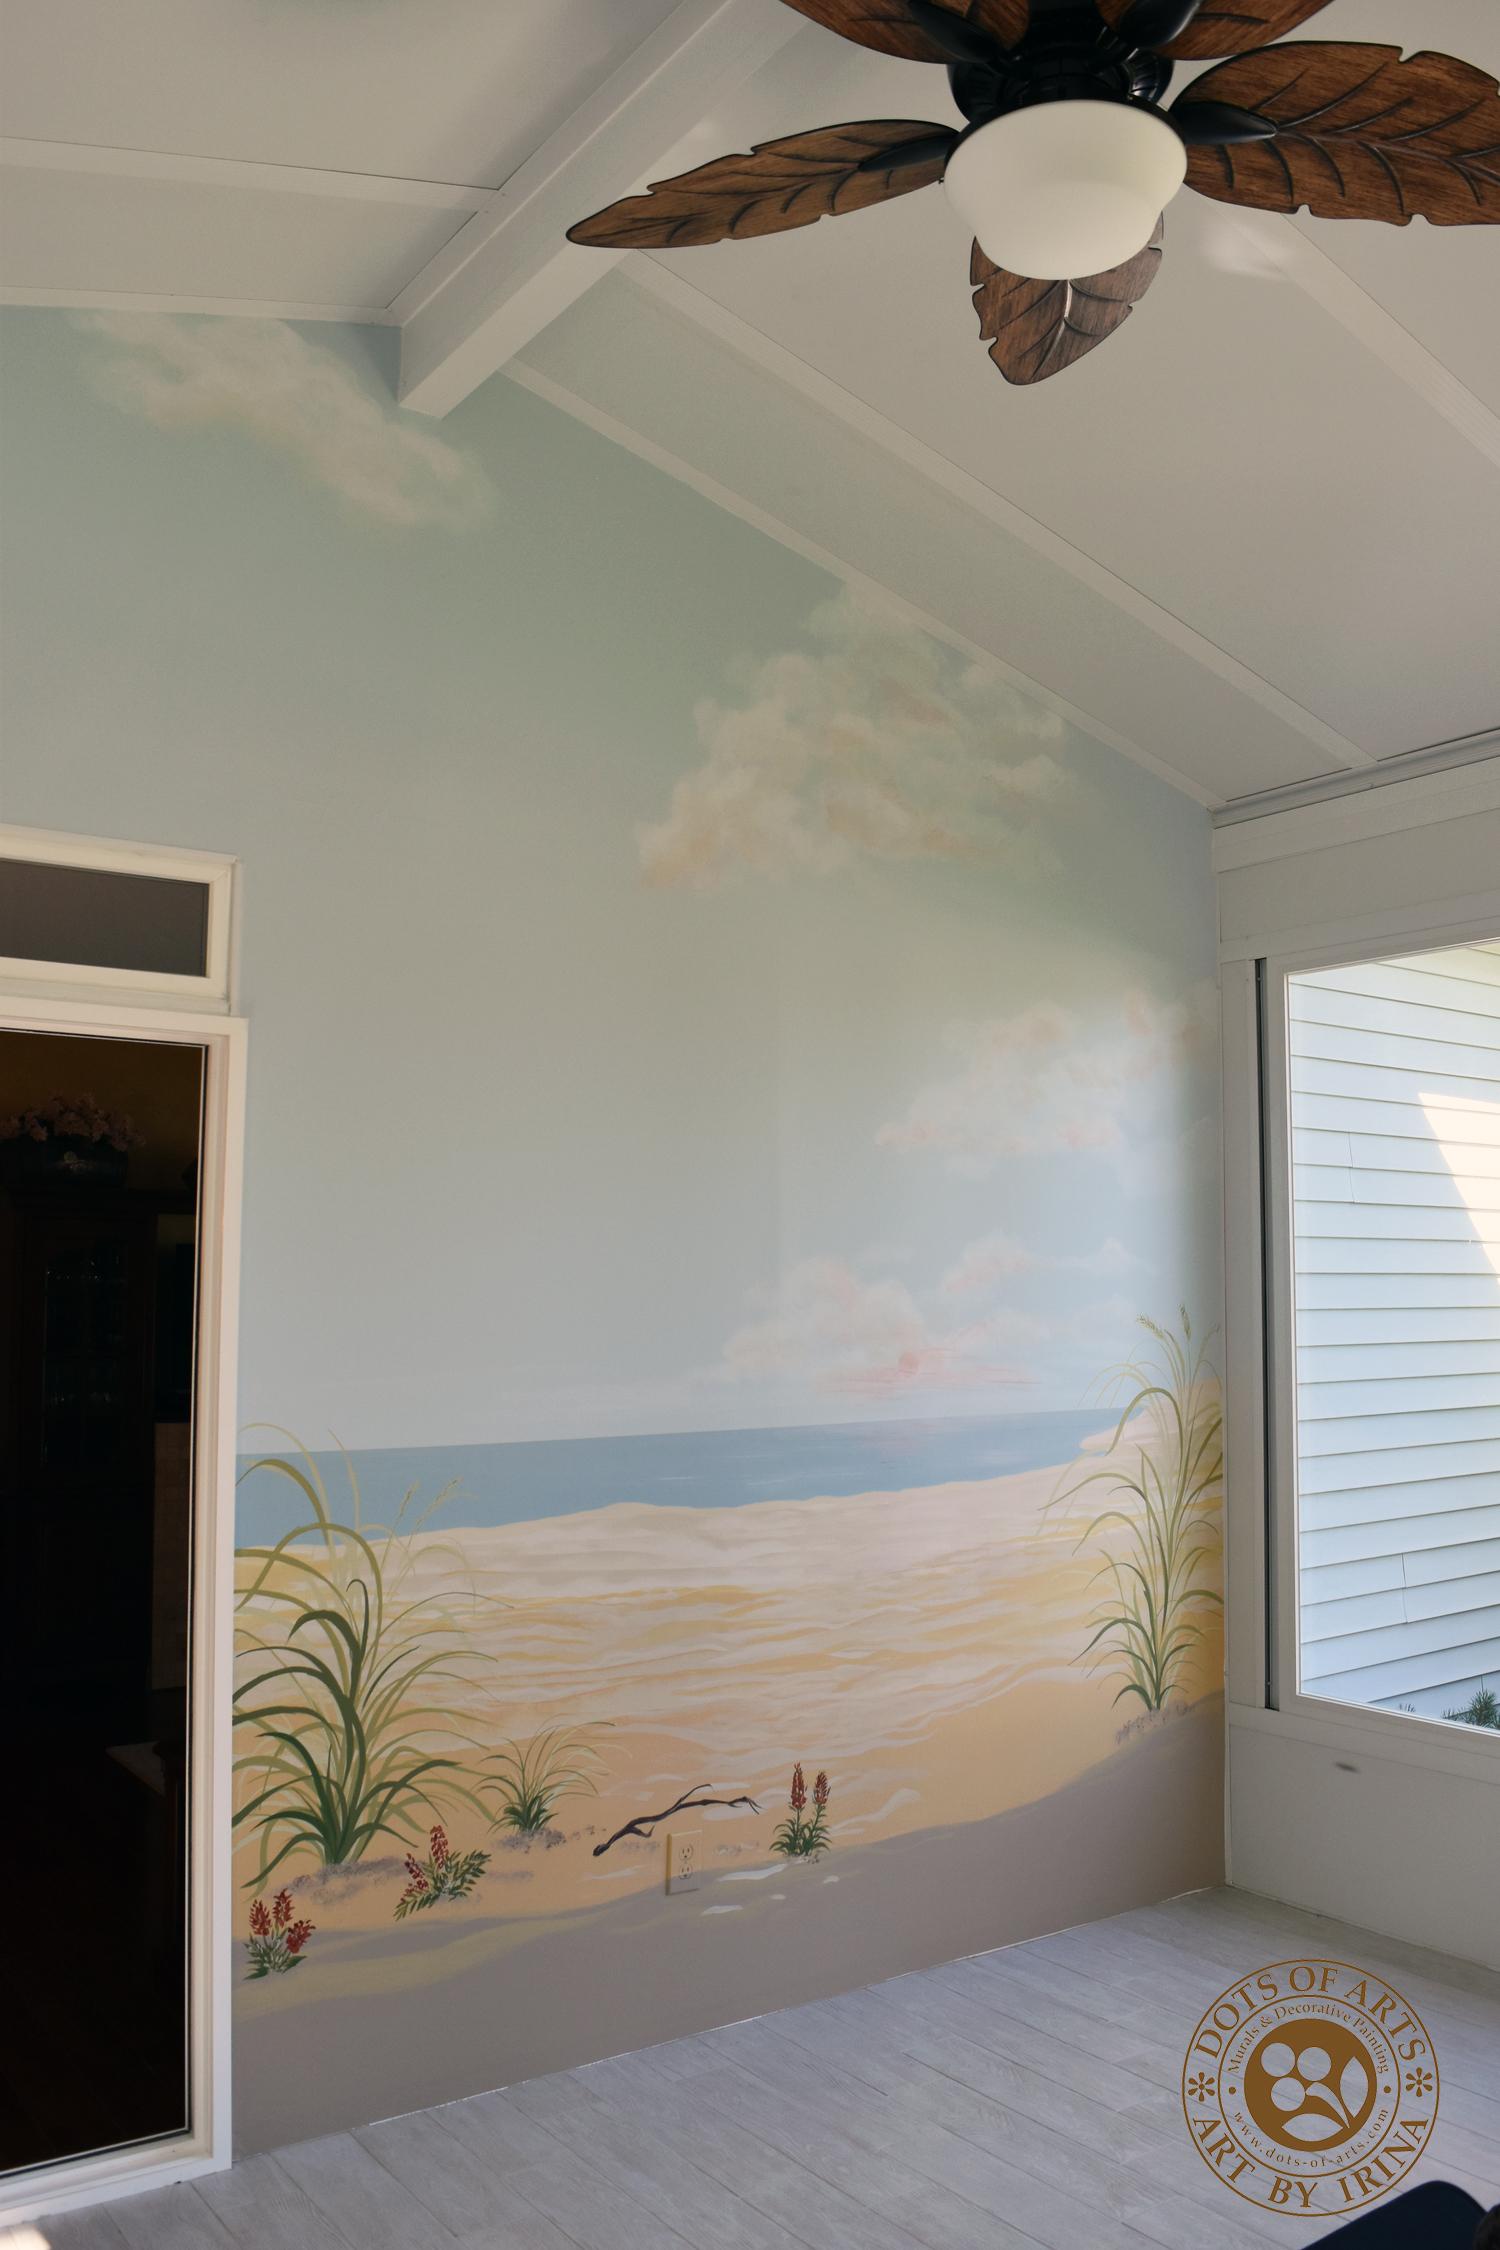 florida-room-mural-full-room-dots-of-arts.jpg